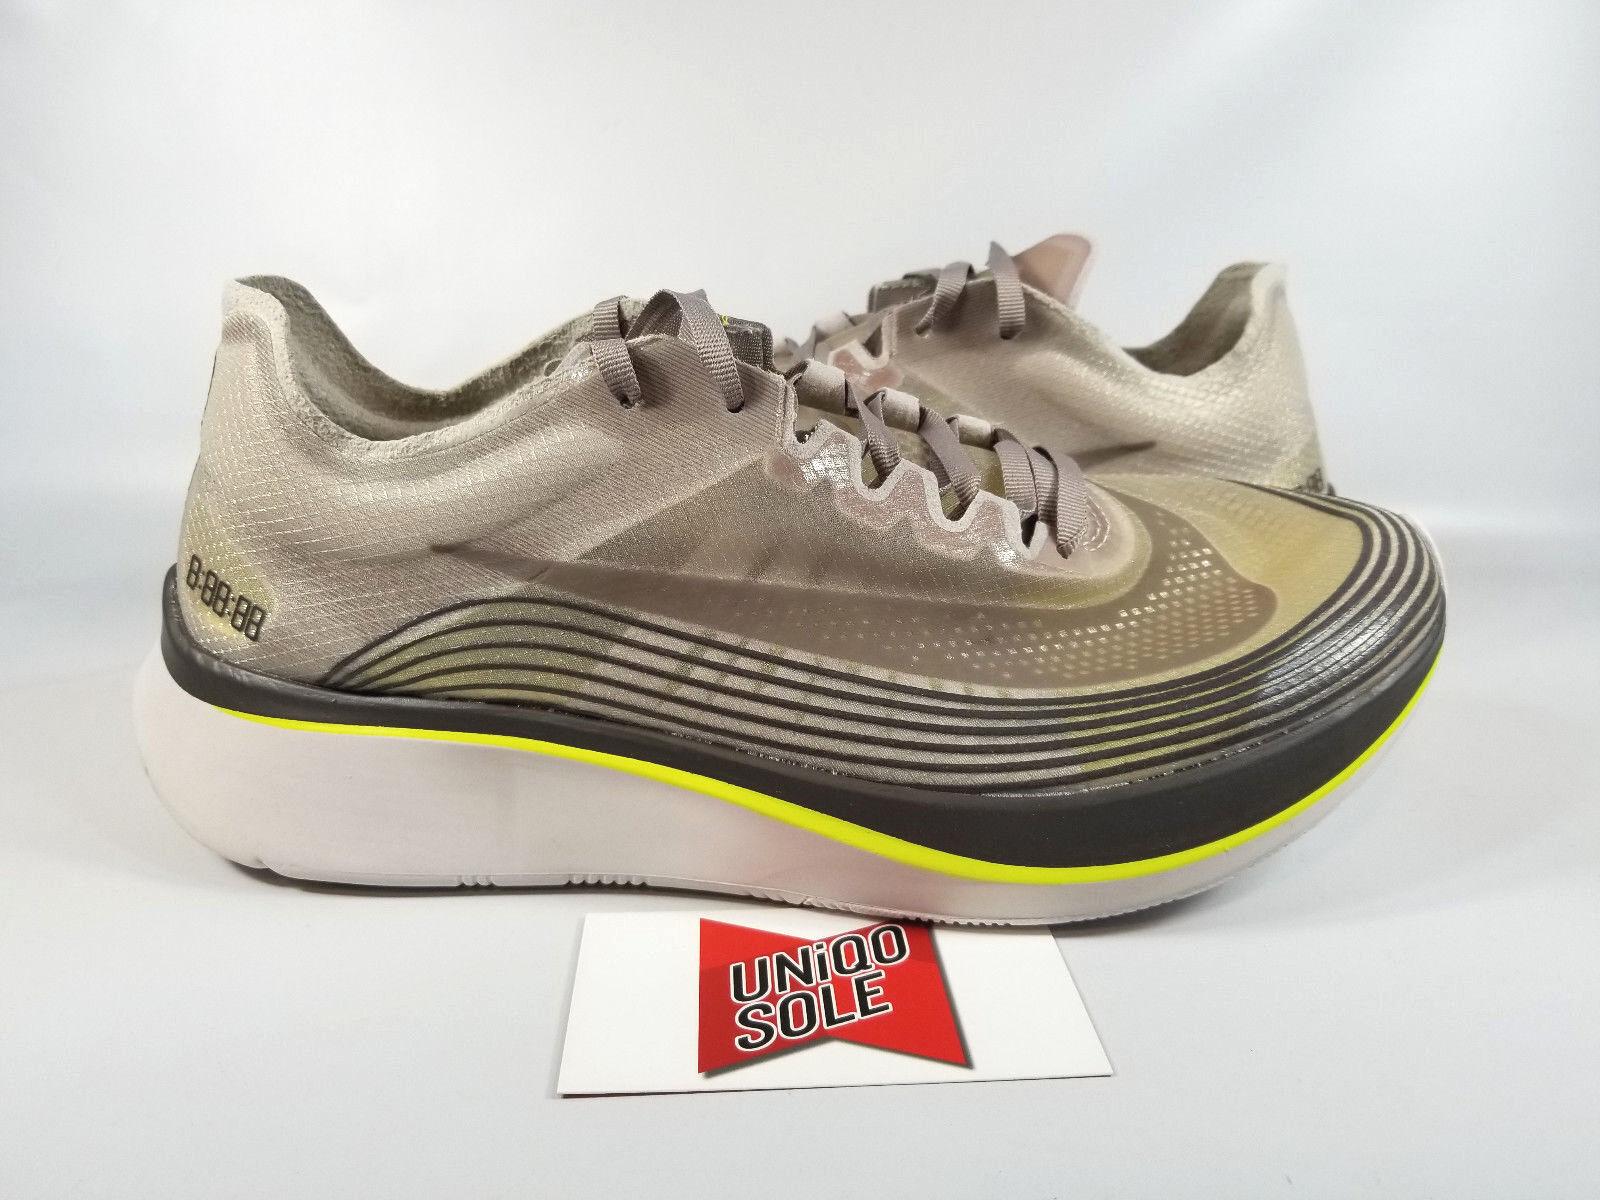 Nike NikeLab Zoom Fly SEPIA STONE GREY AA3172-201 sz 9 RUNNING RACING VAPORFLY